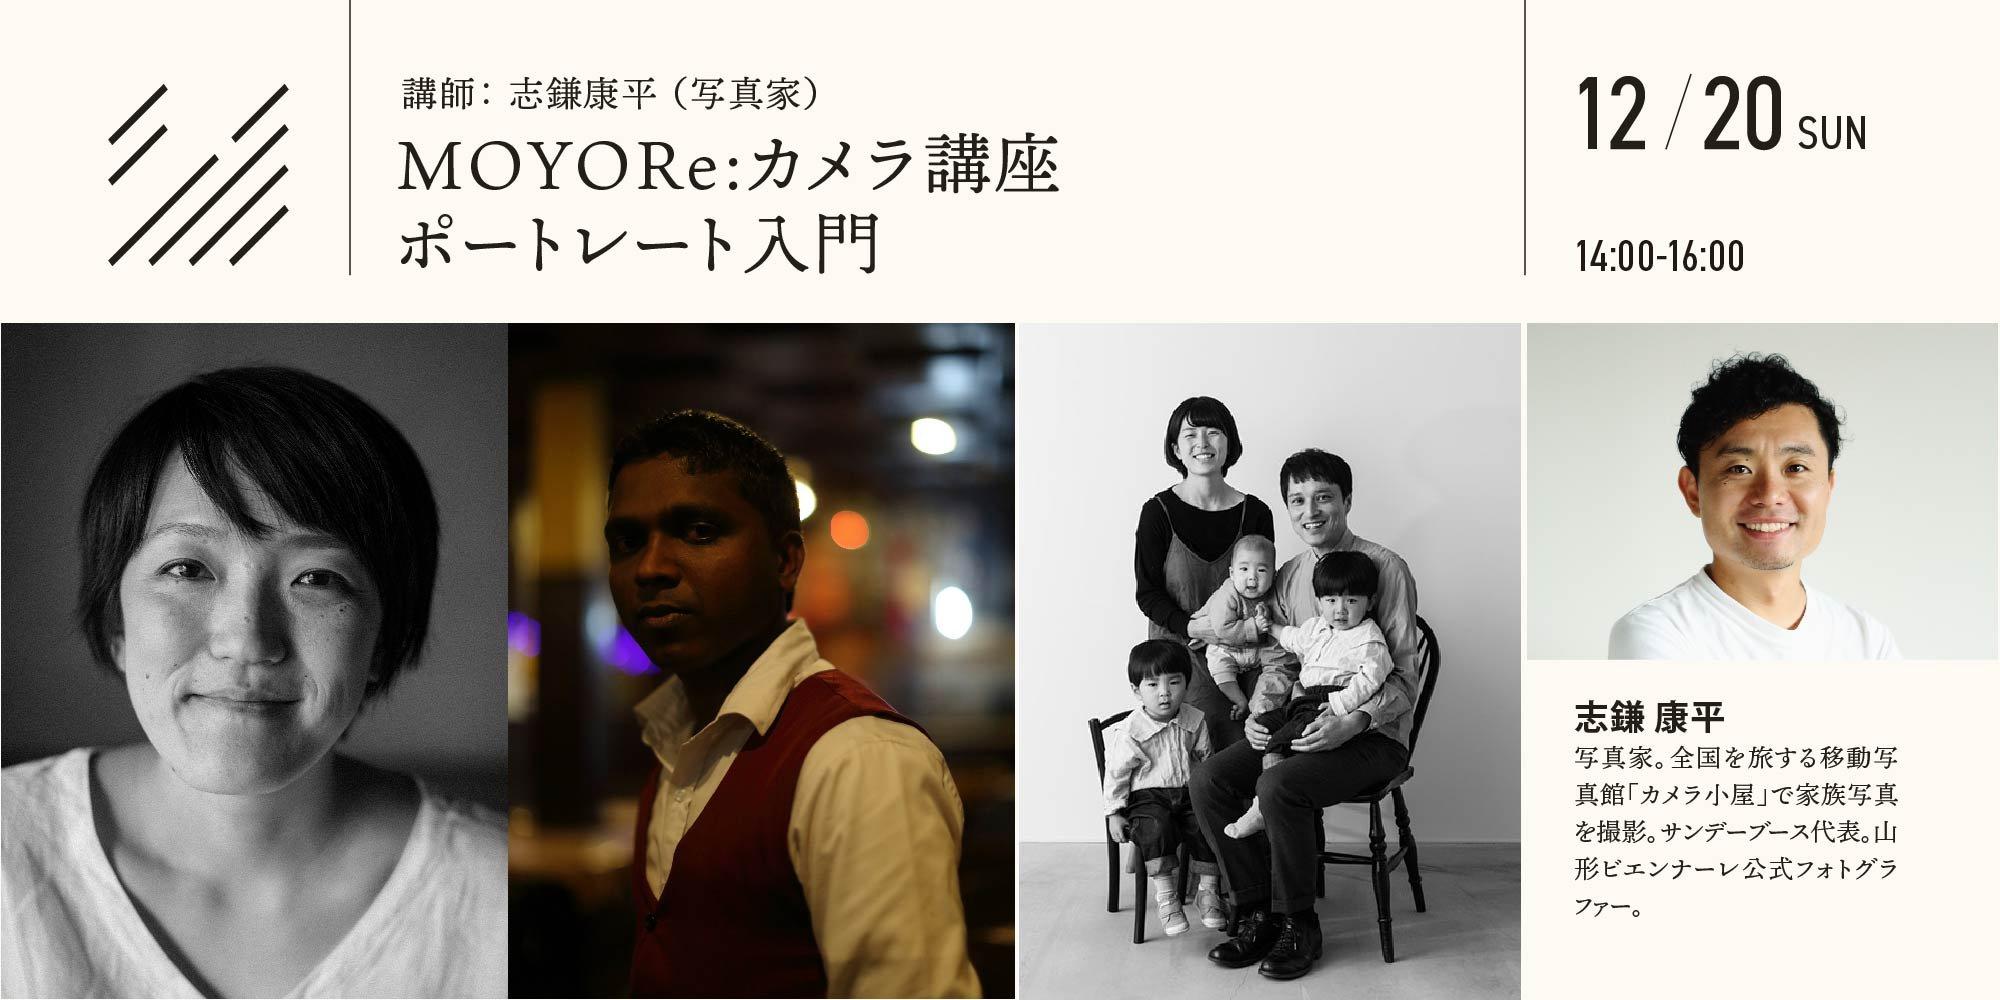 MOYORe:カメラ講座 -ポートレート入門-